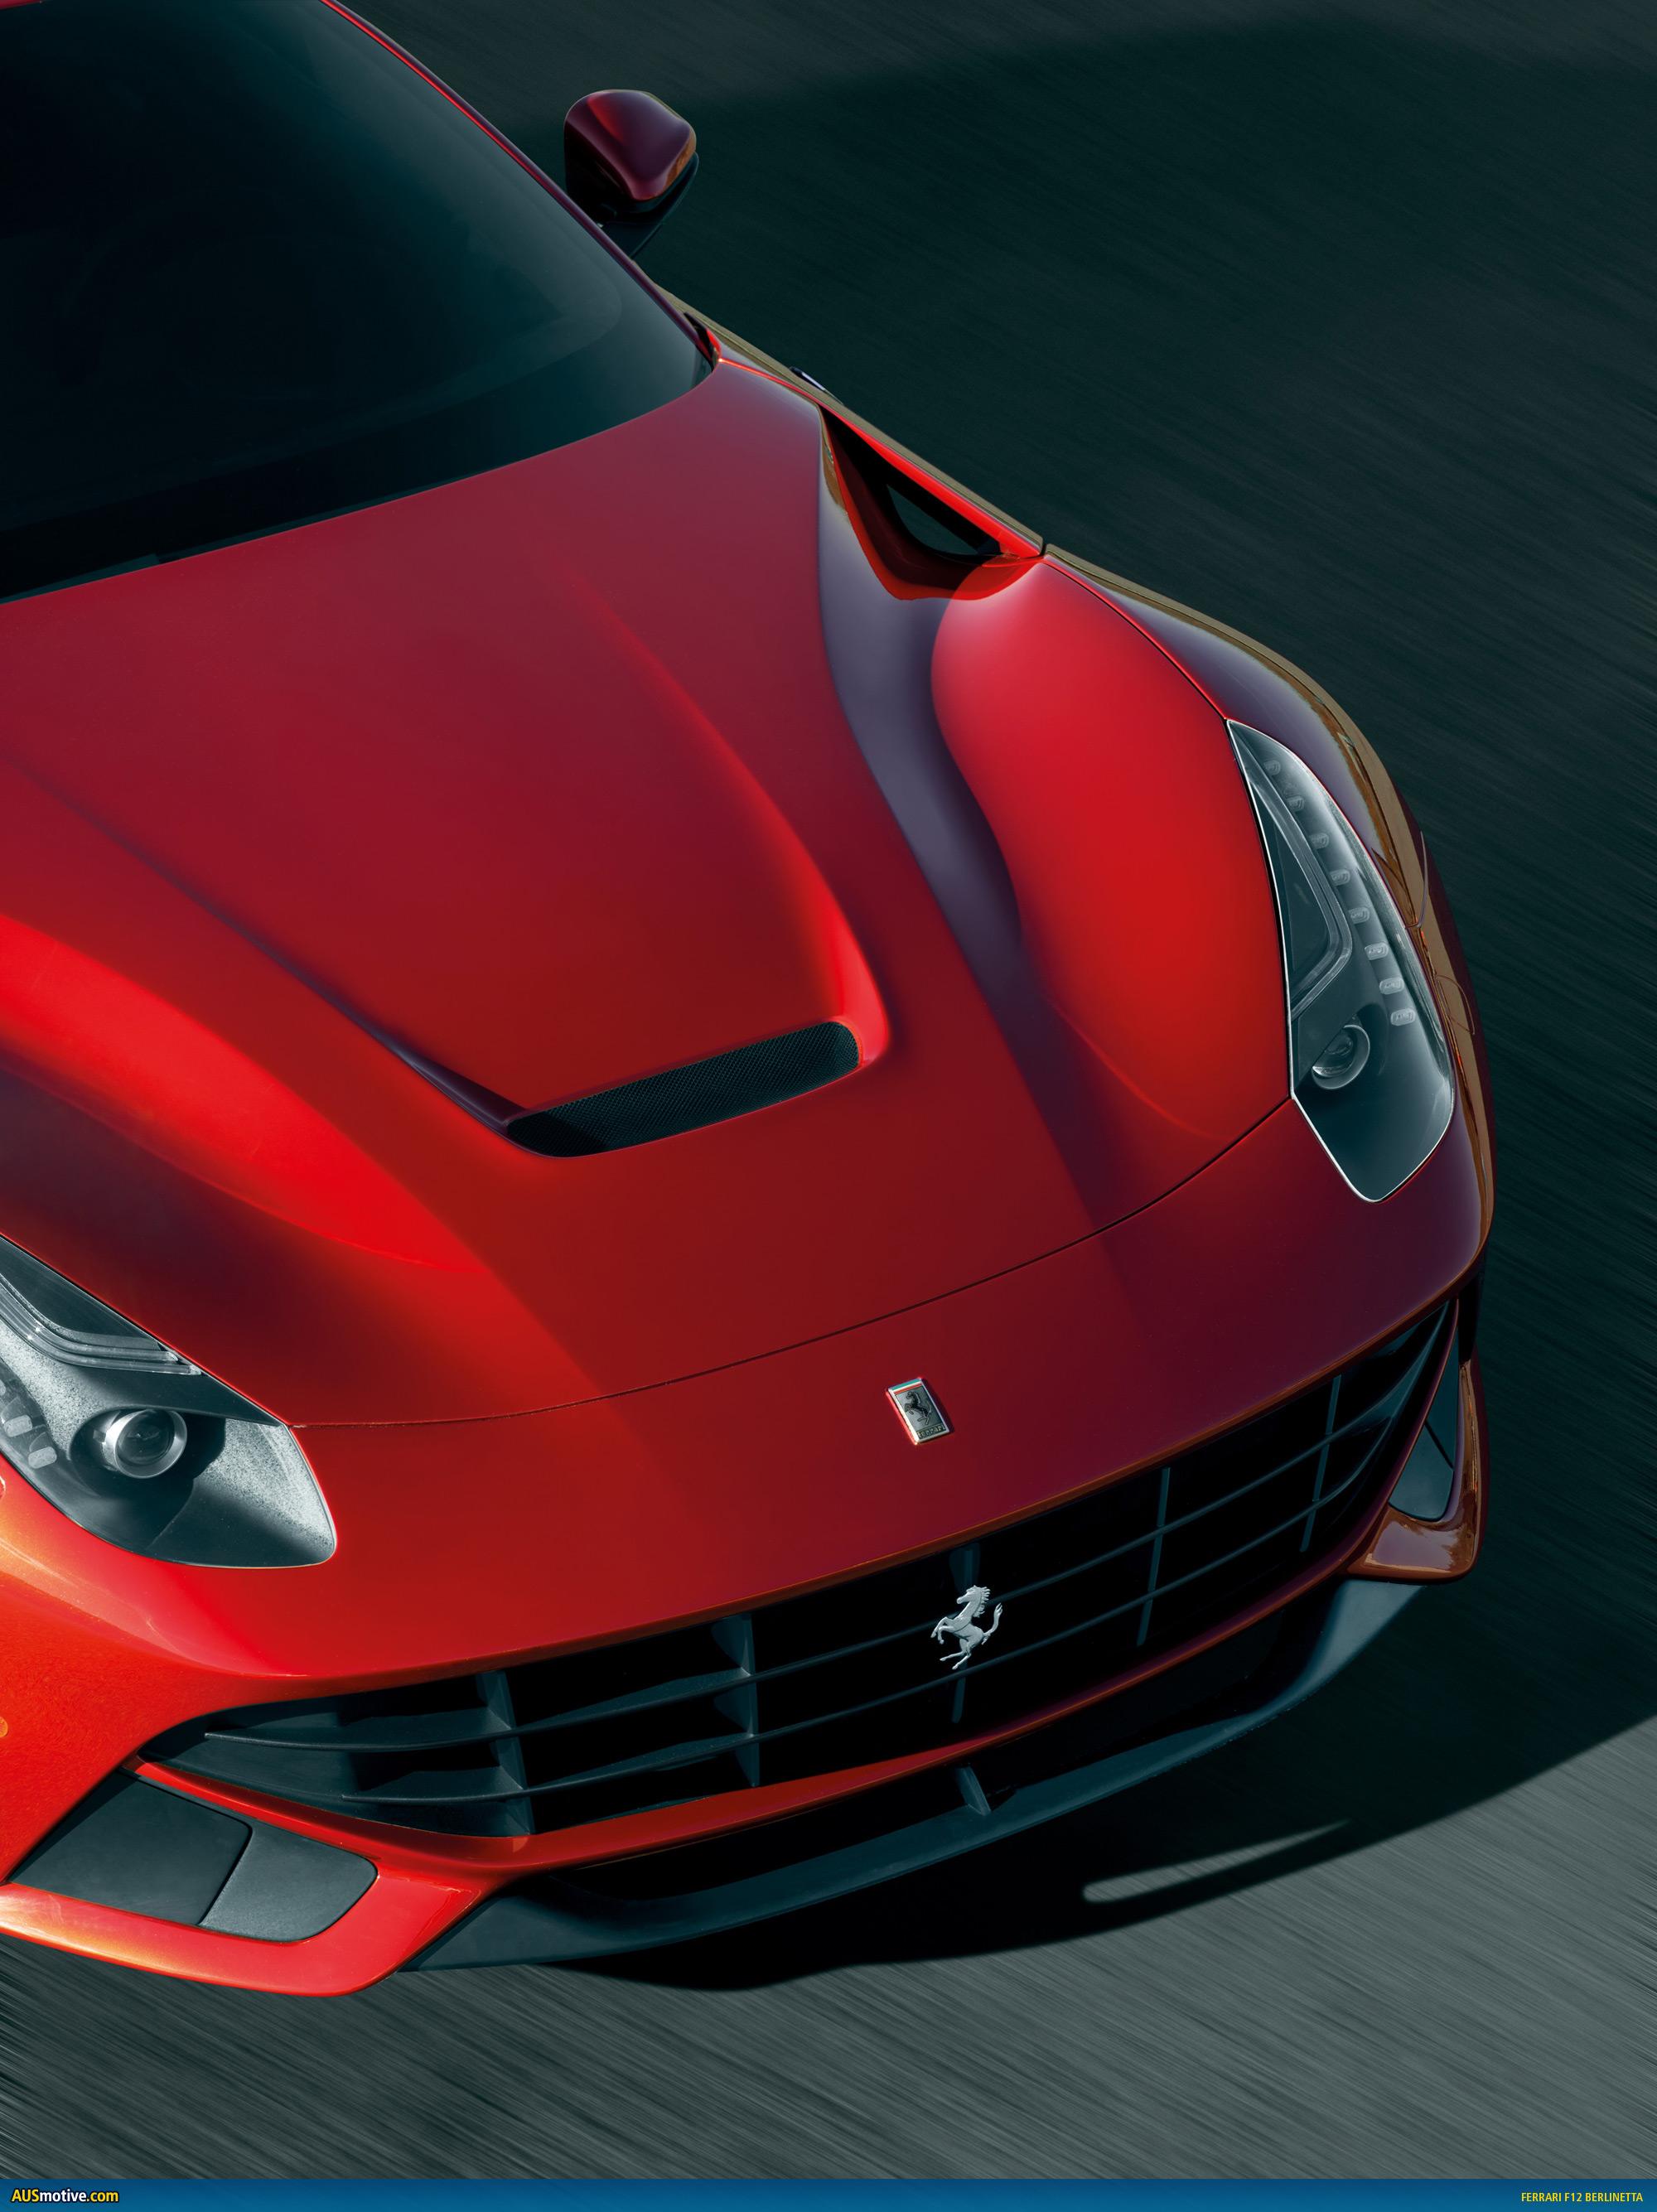 ausmotive com  u00bb ferrari f12 berlinetta  u2013 australian pricing